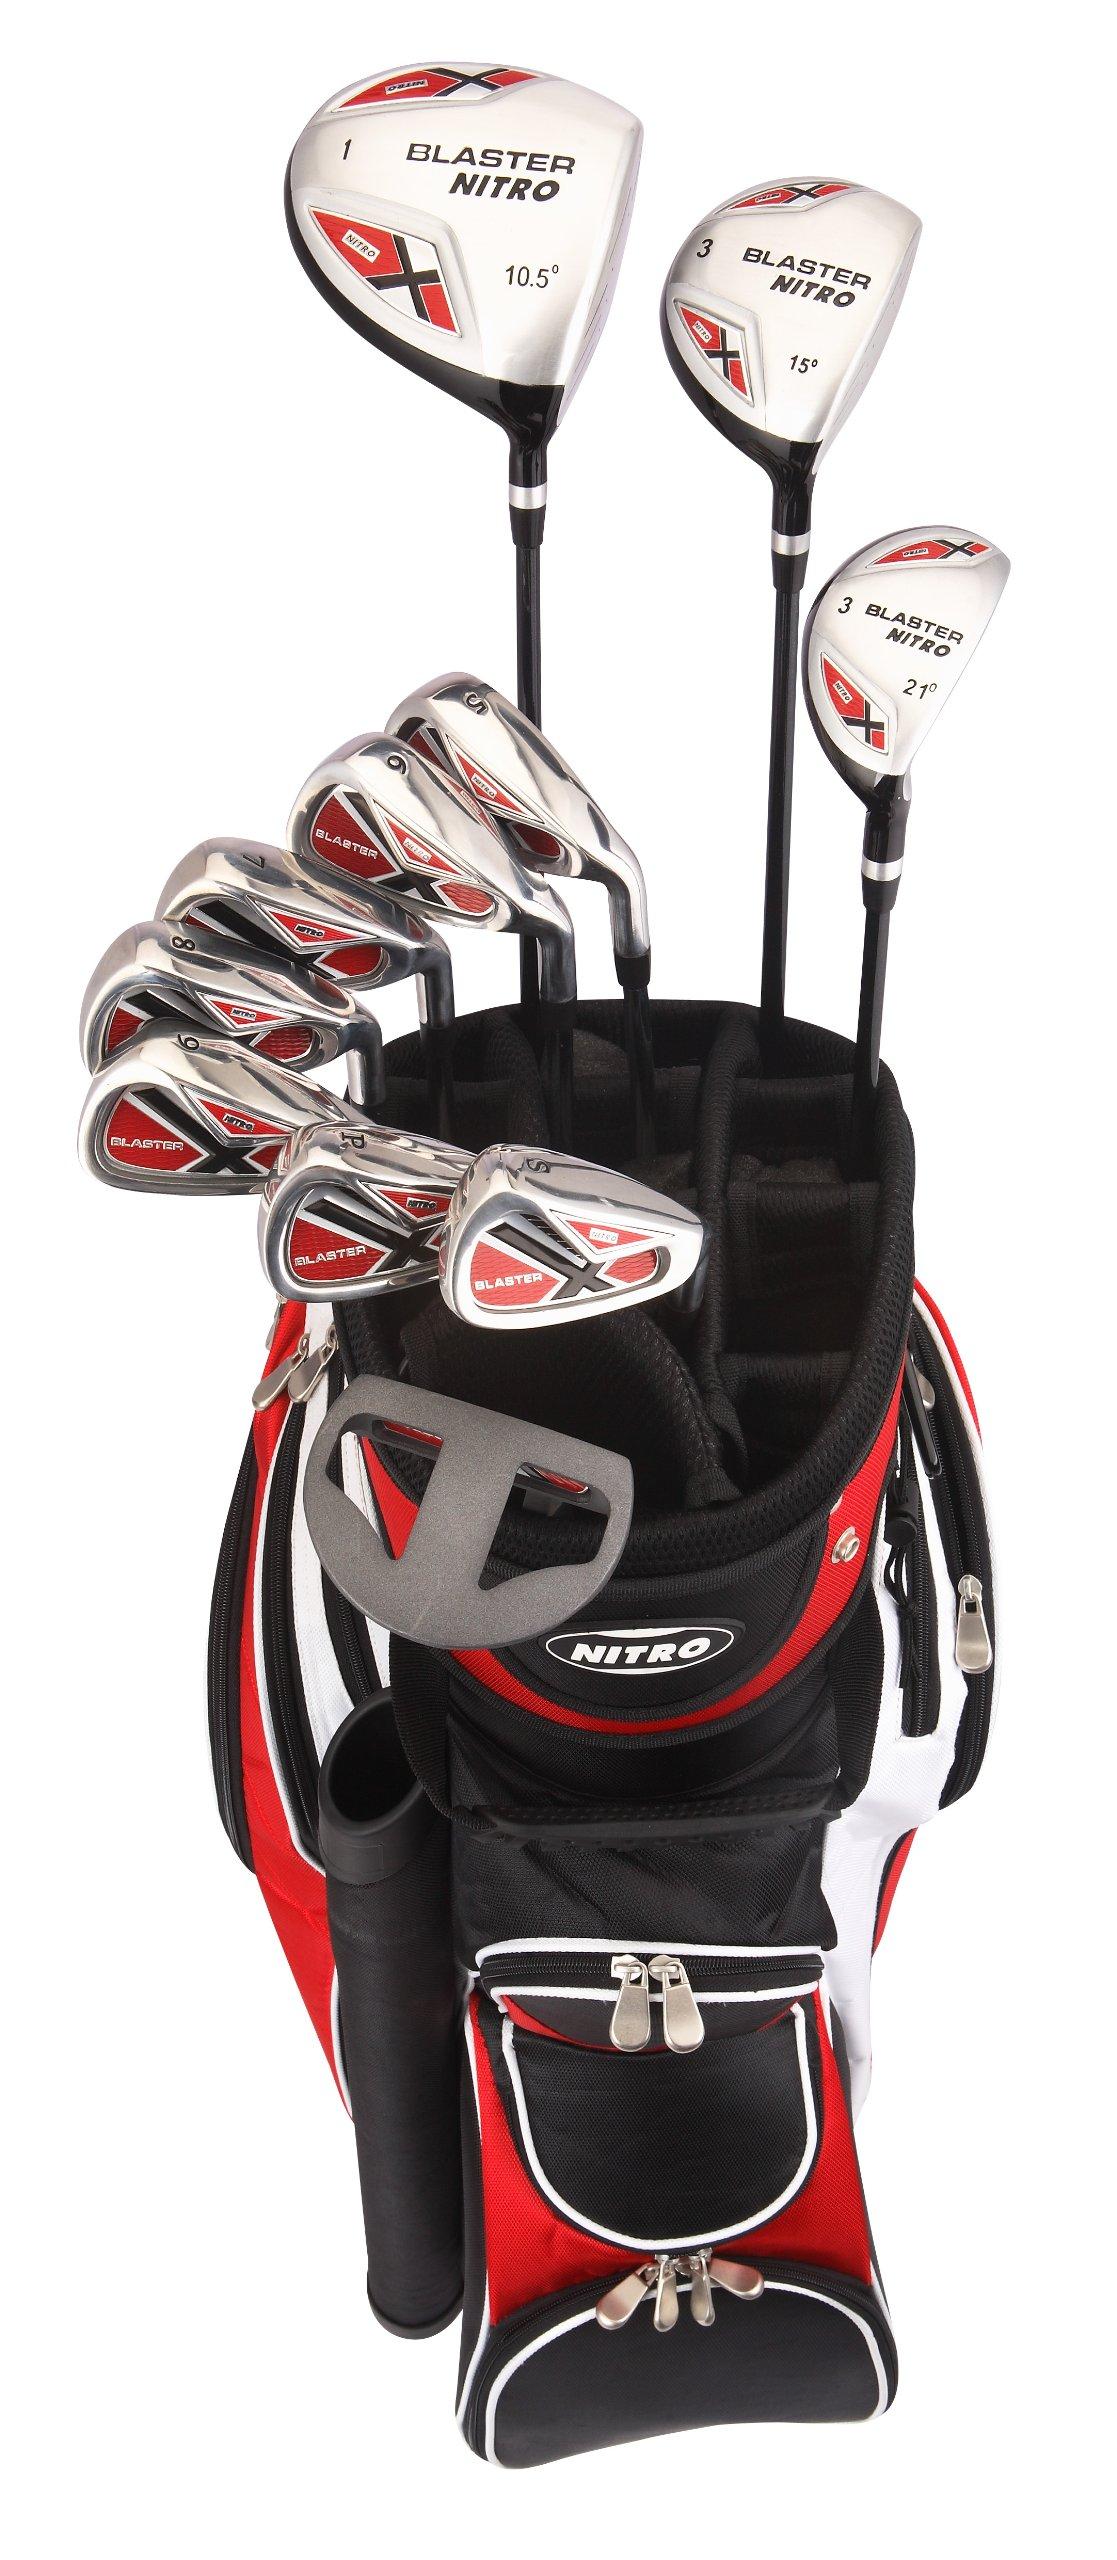 Nitro Men's Blaster Golf Set (15-Piece), Left Hand